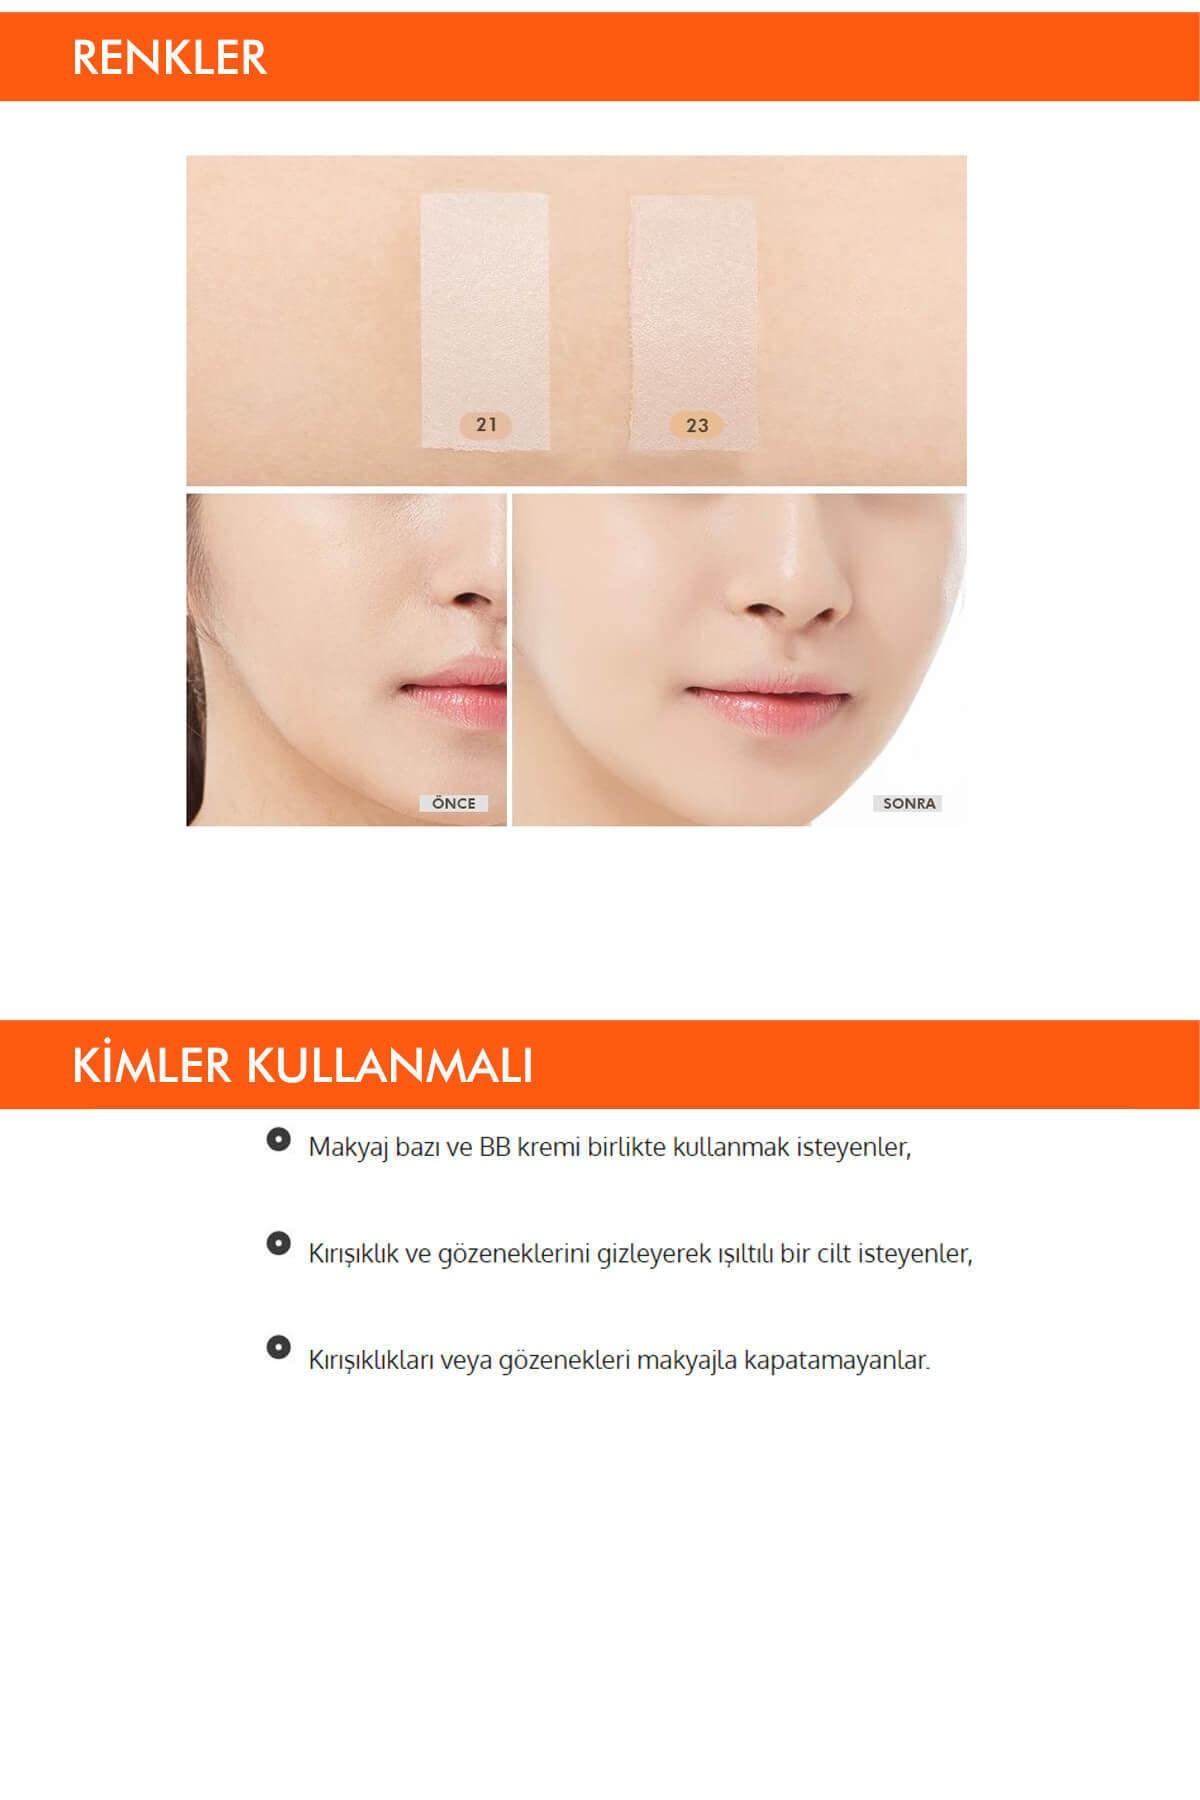 Missha Gözenekleri ve İnce Çizgileri Kapatan BB Krem 44g Signature Wrinkle Fill-up BB Cream SPF37PA++No.21 3